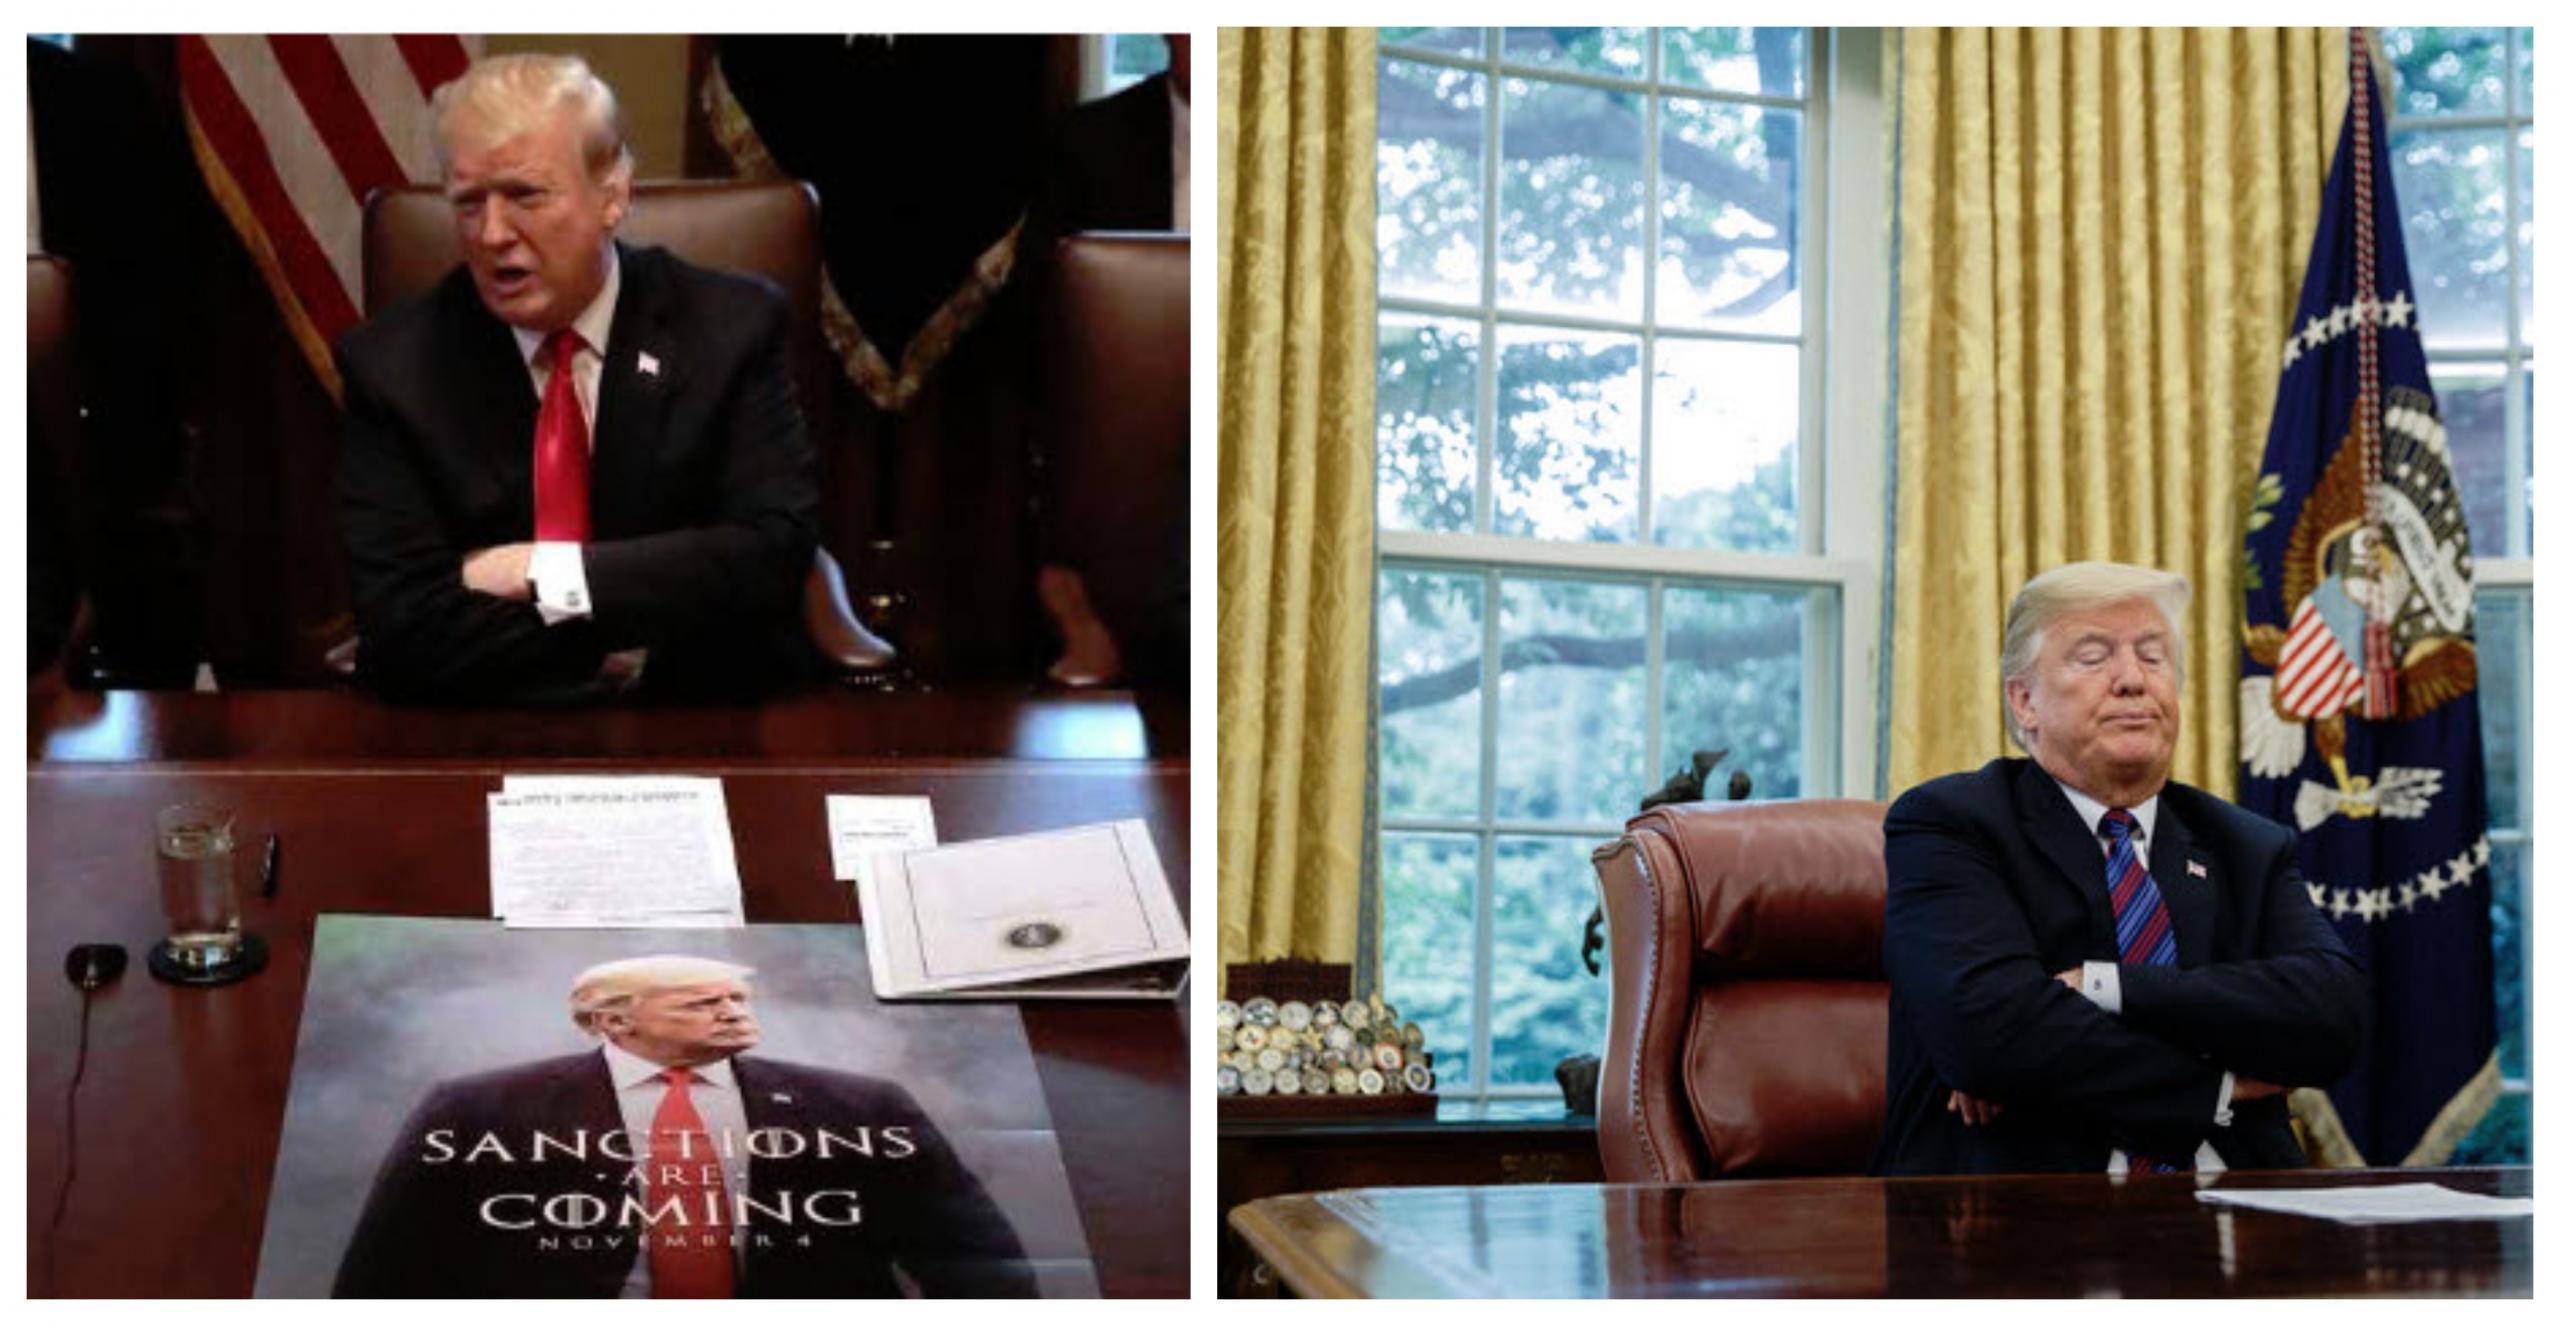 Donald Trump - vrh zveze NATO 2018